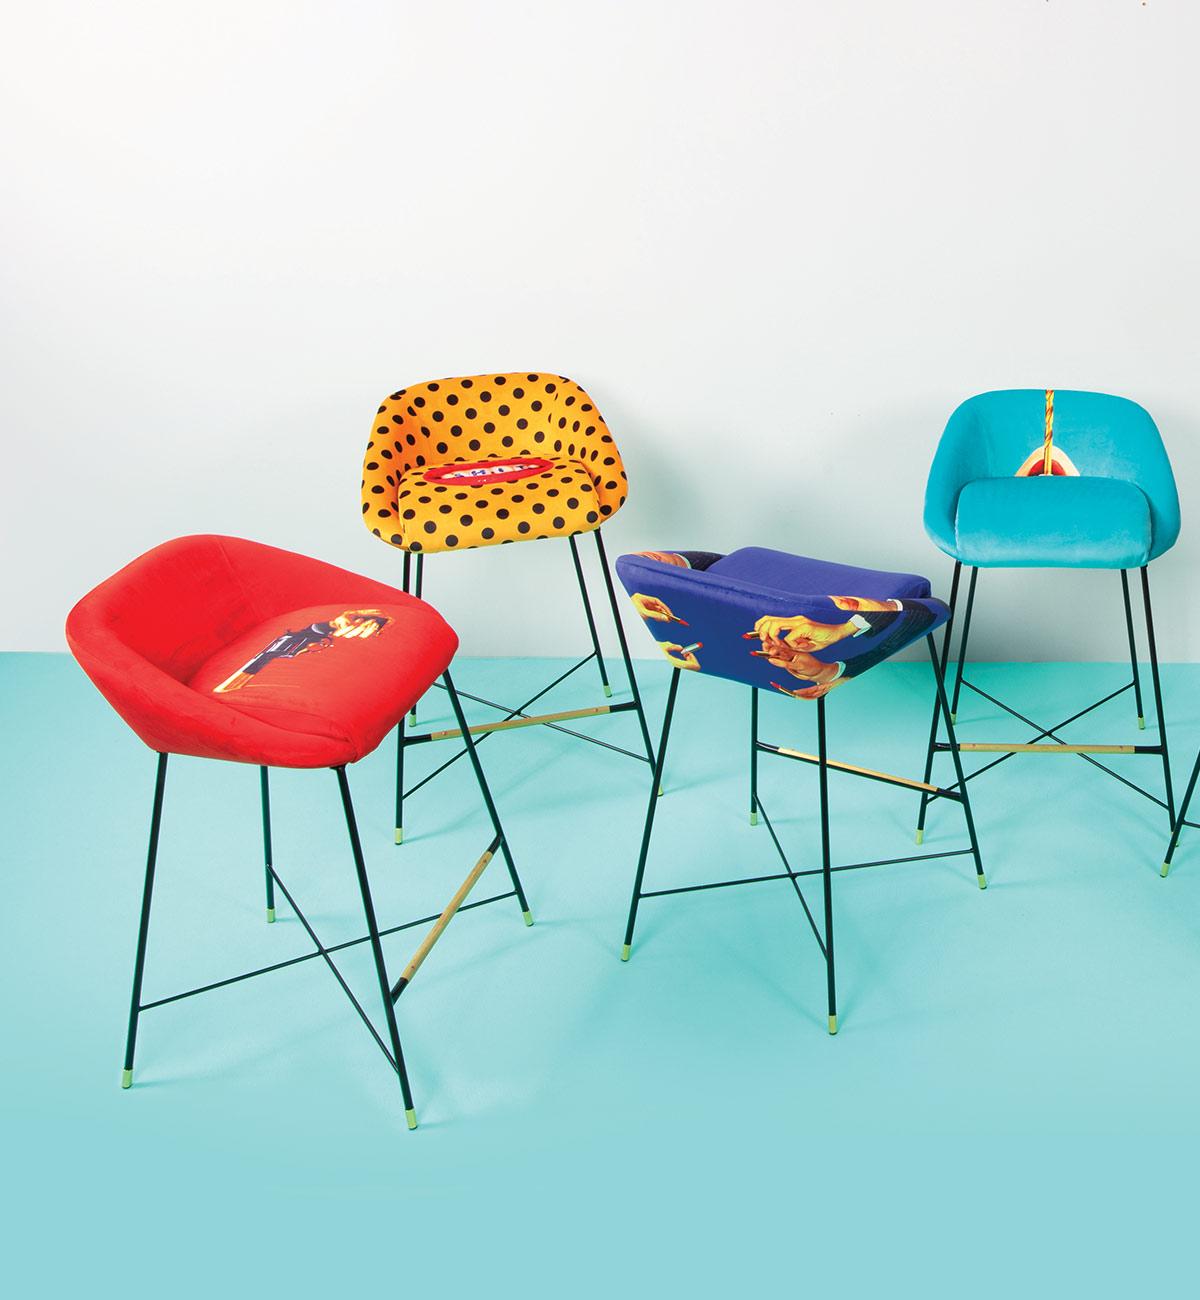 https://storage.googleapis.com/dtk-fenton-fenton/page%2Fseletti-bar-stools-lifestyle_1561008896691.jpg